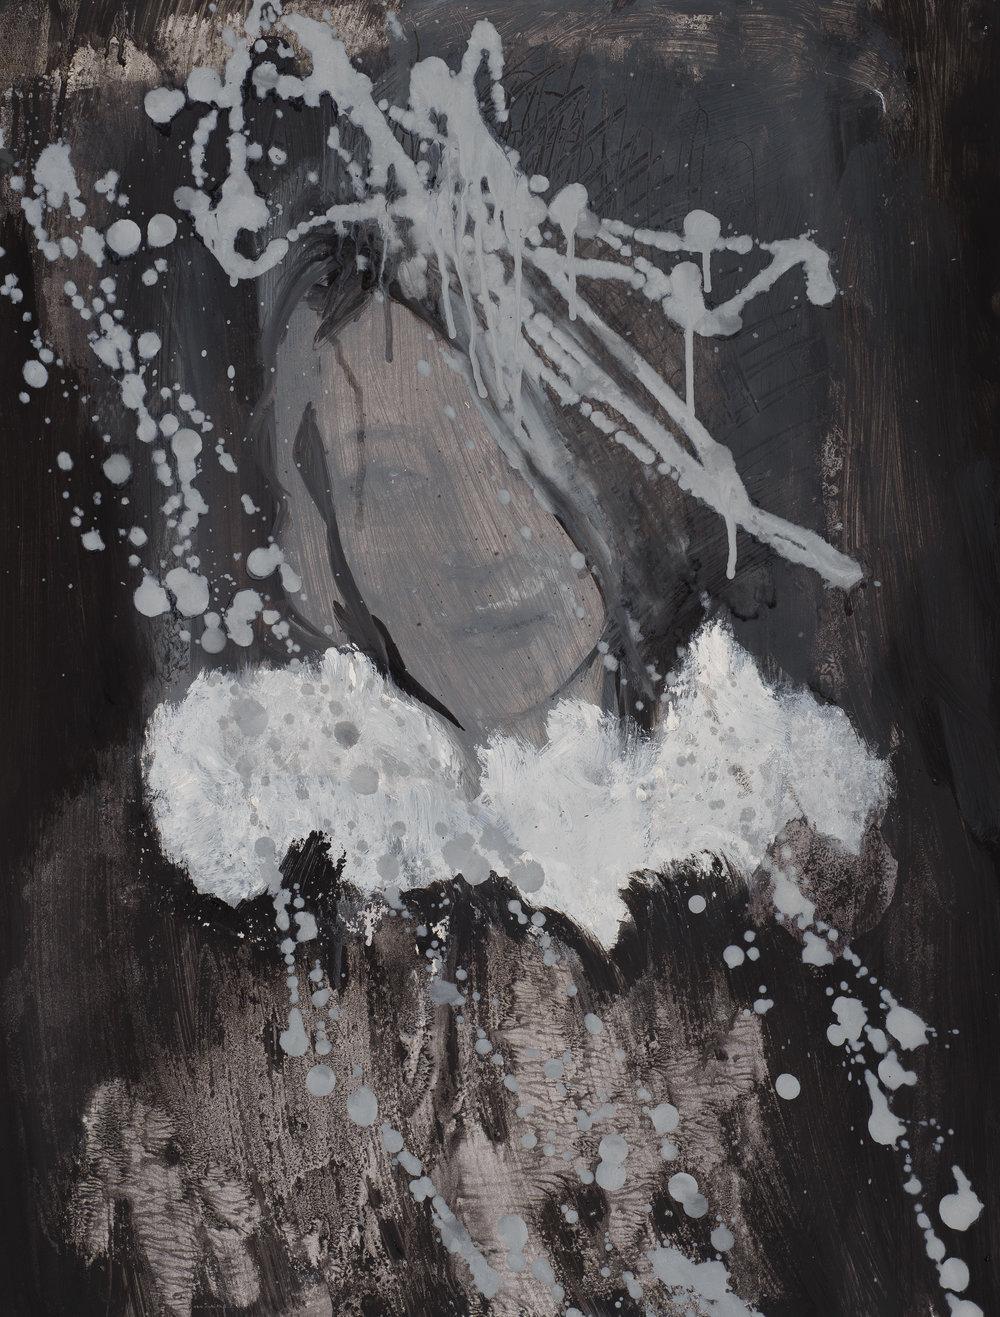 Eros couronné de roses 6 - 201650 x 65 cm